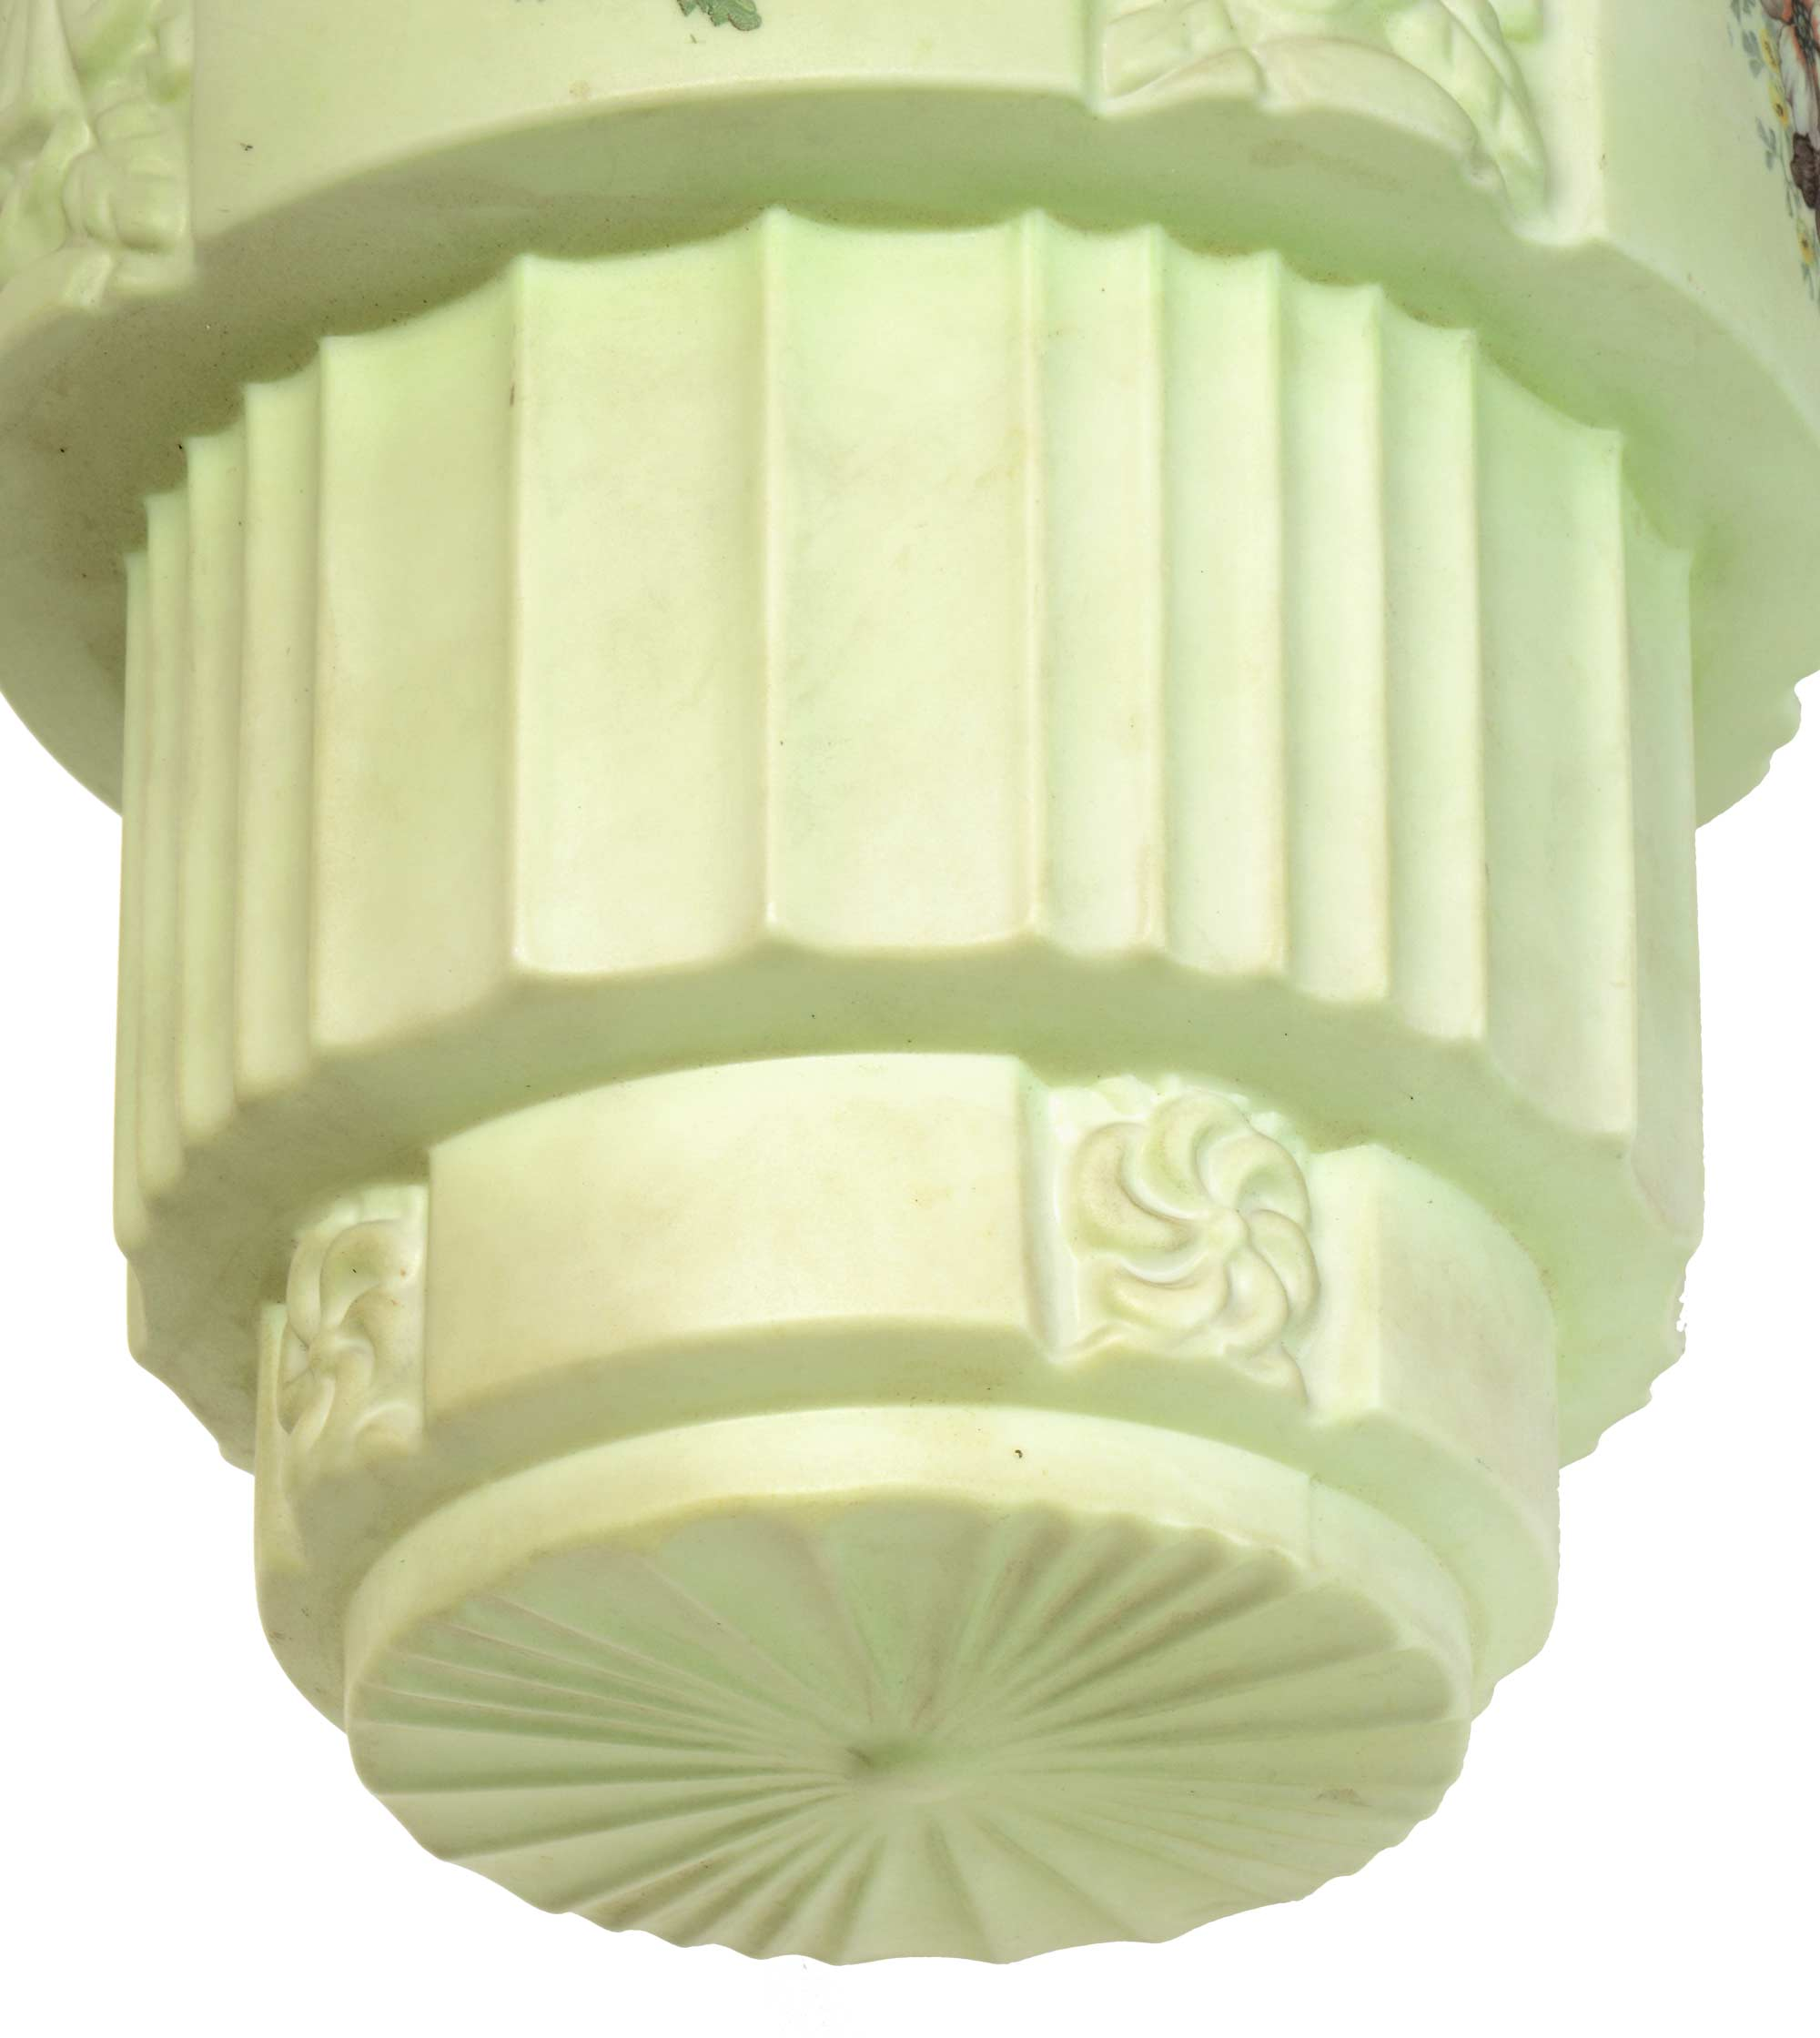 46666-green-floral-deco-flushmount-detail.jpg